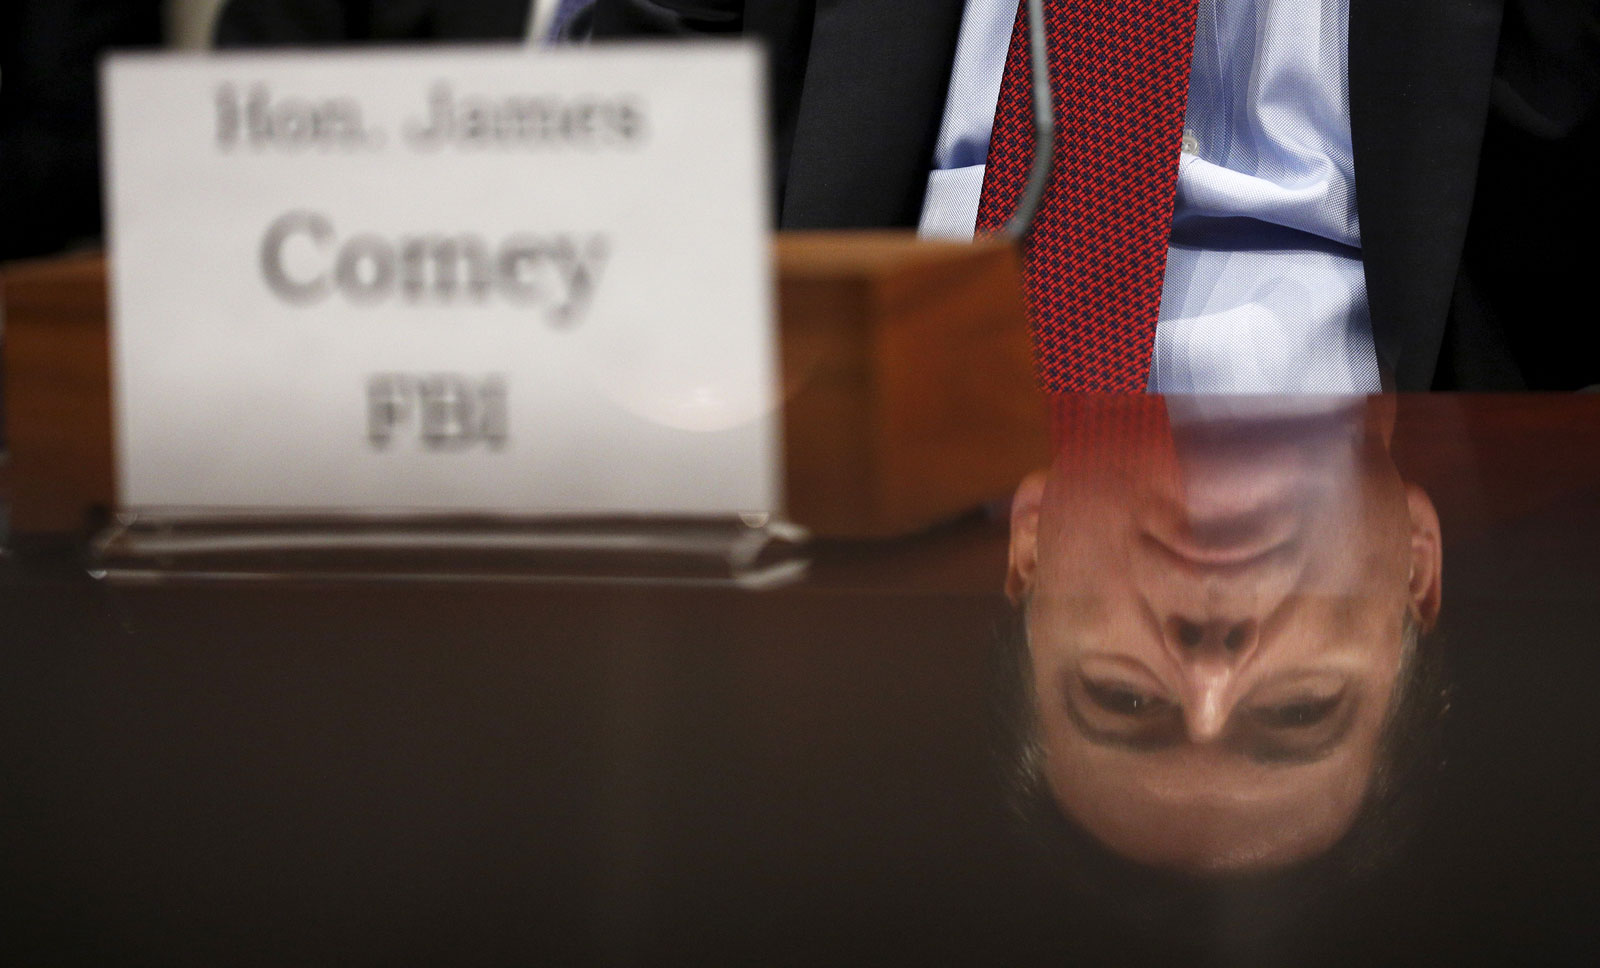 FBI Director James Comey, Washington, D.C., February 25, 2016